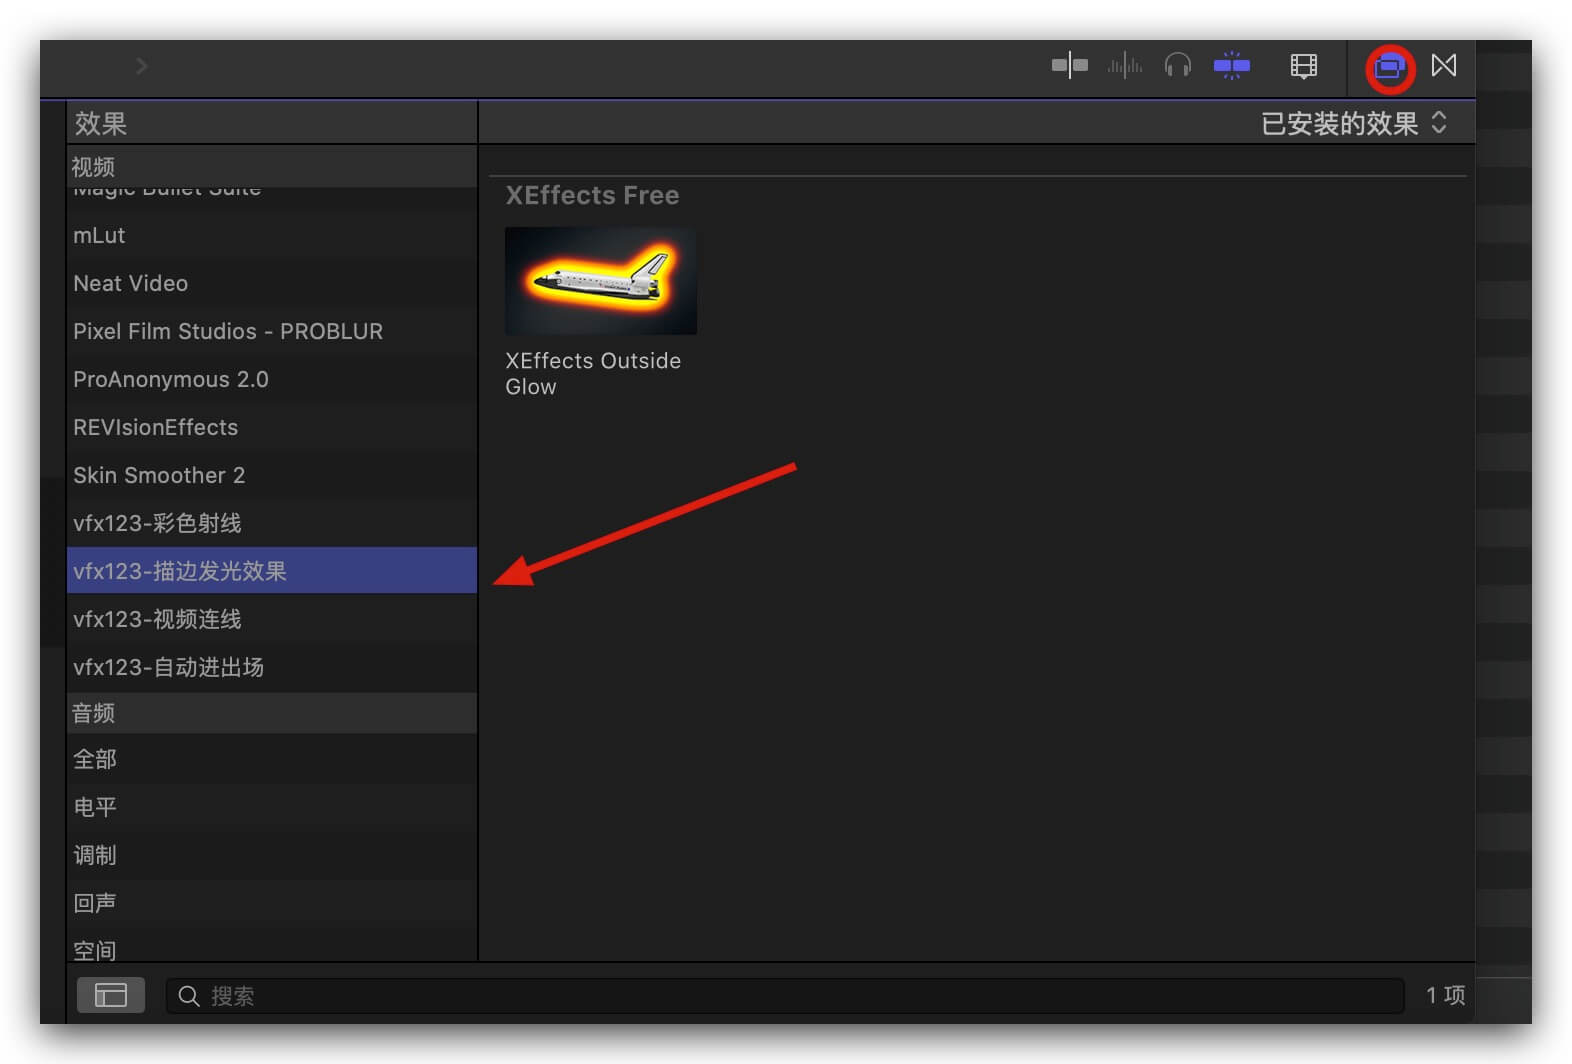 fcpx插件 添加描边外发光效果小工具 Outside Glow